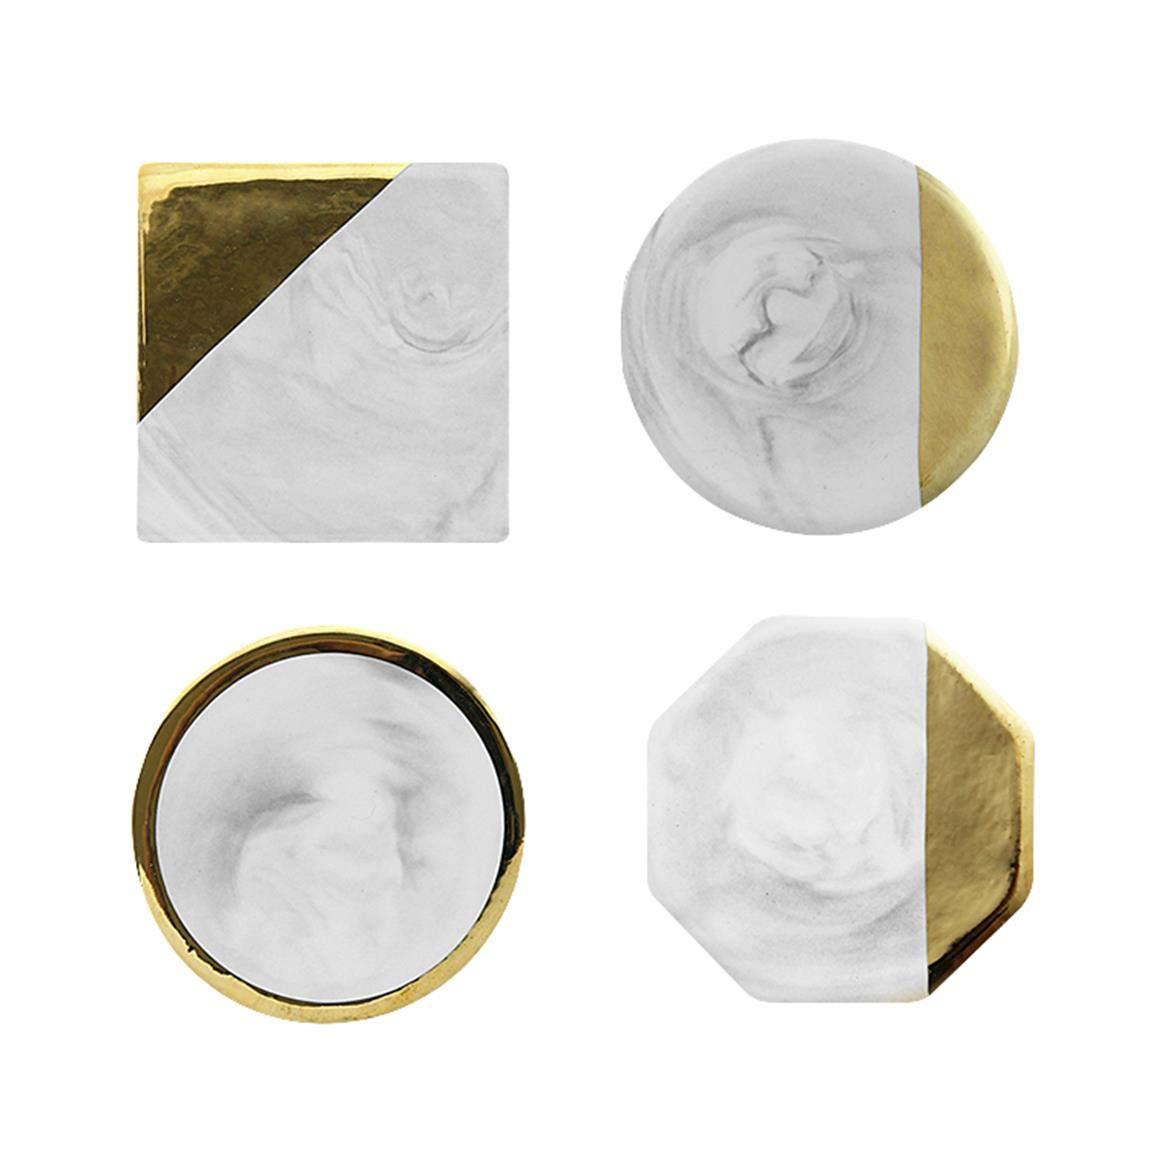 Autek 4pcs Premium Marble Coasters Ceramic Art Coasters Gold Edge White Polished Coasters for Drink Tea and Coffee Set